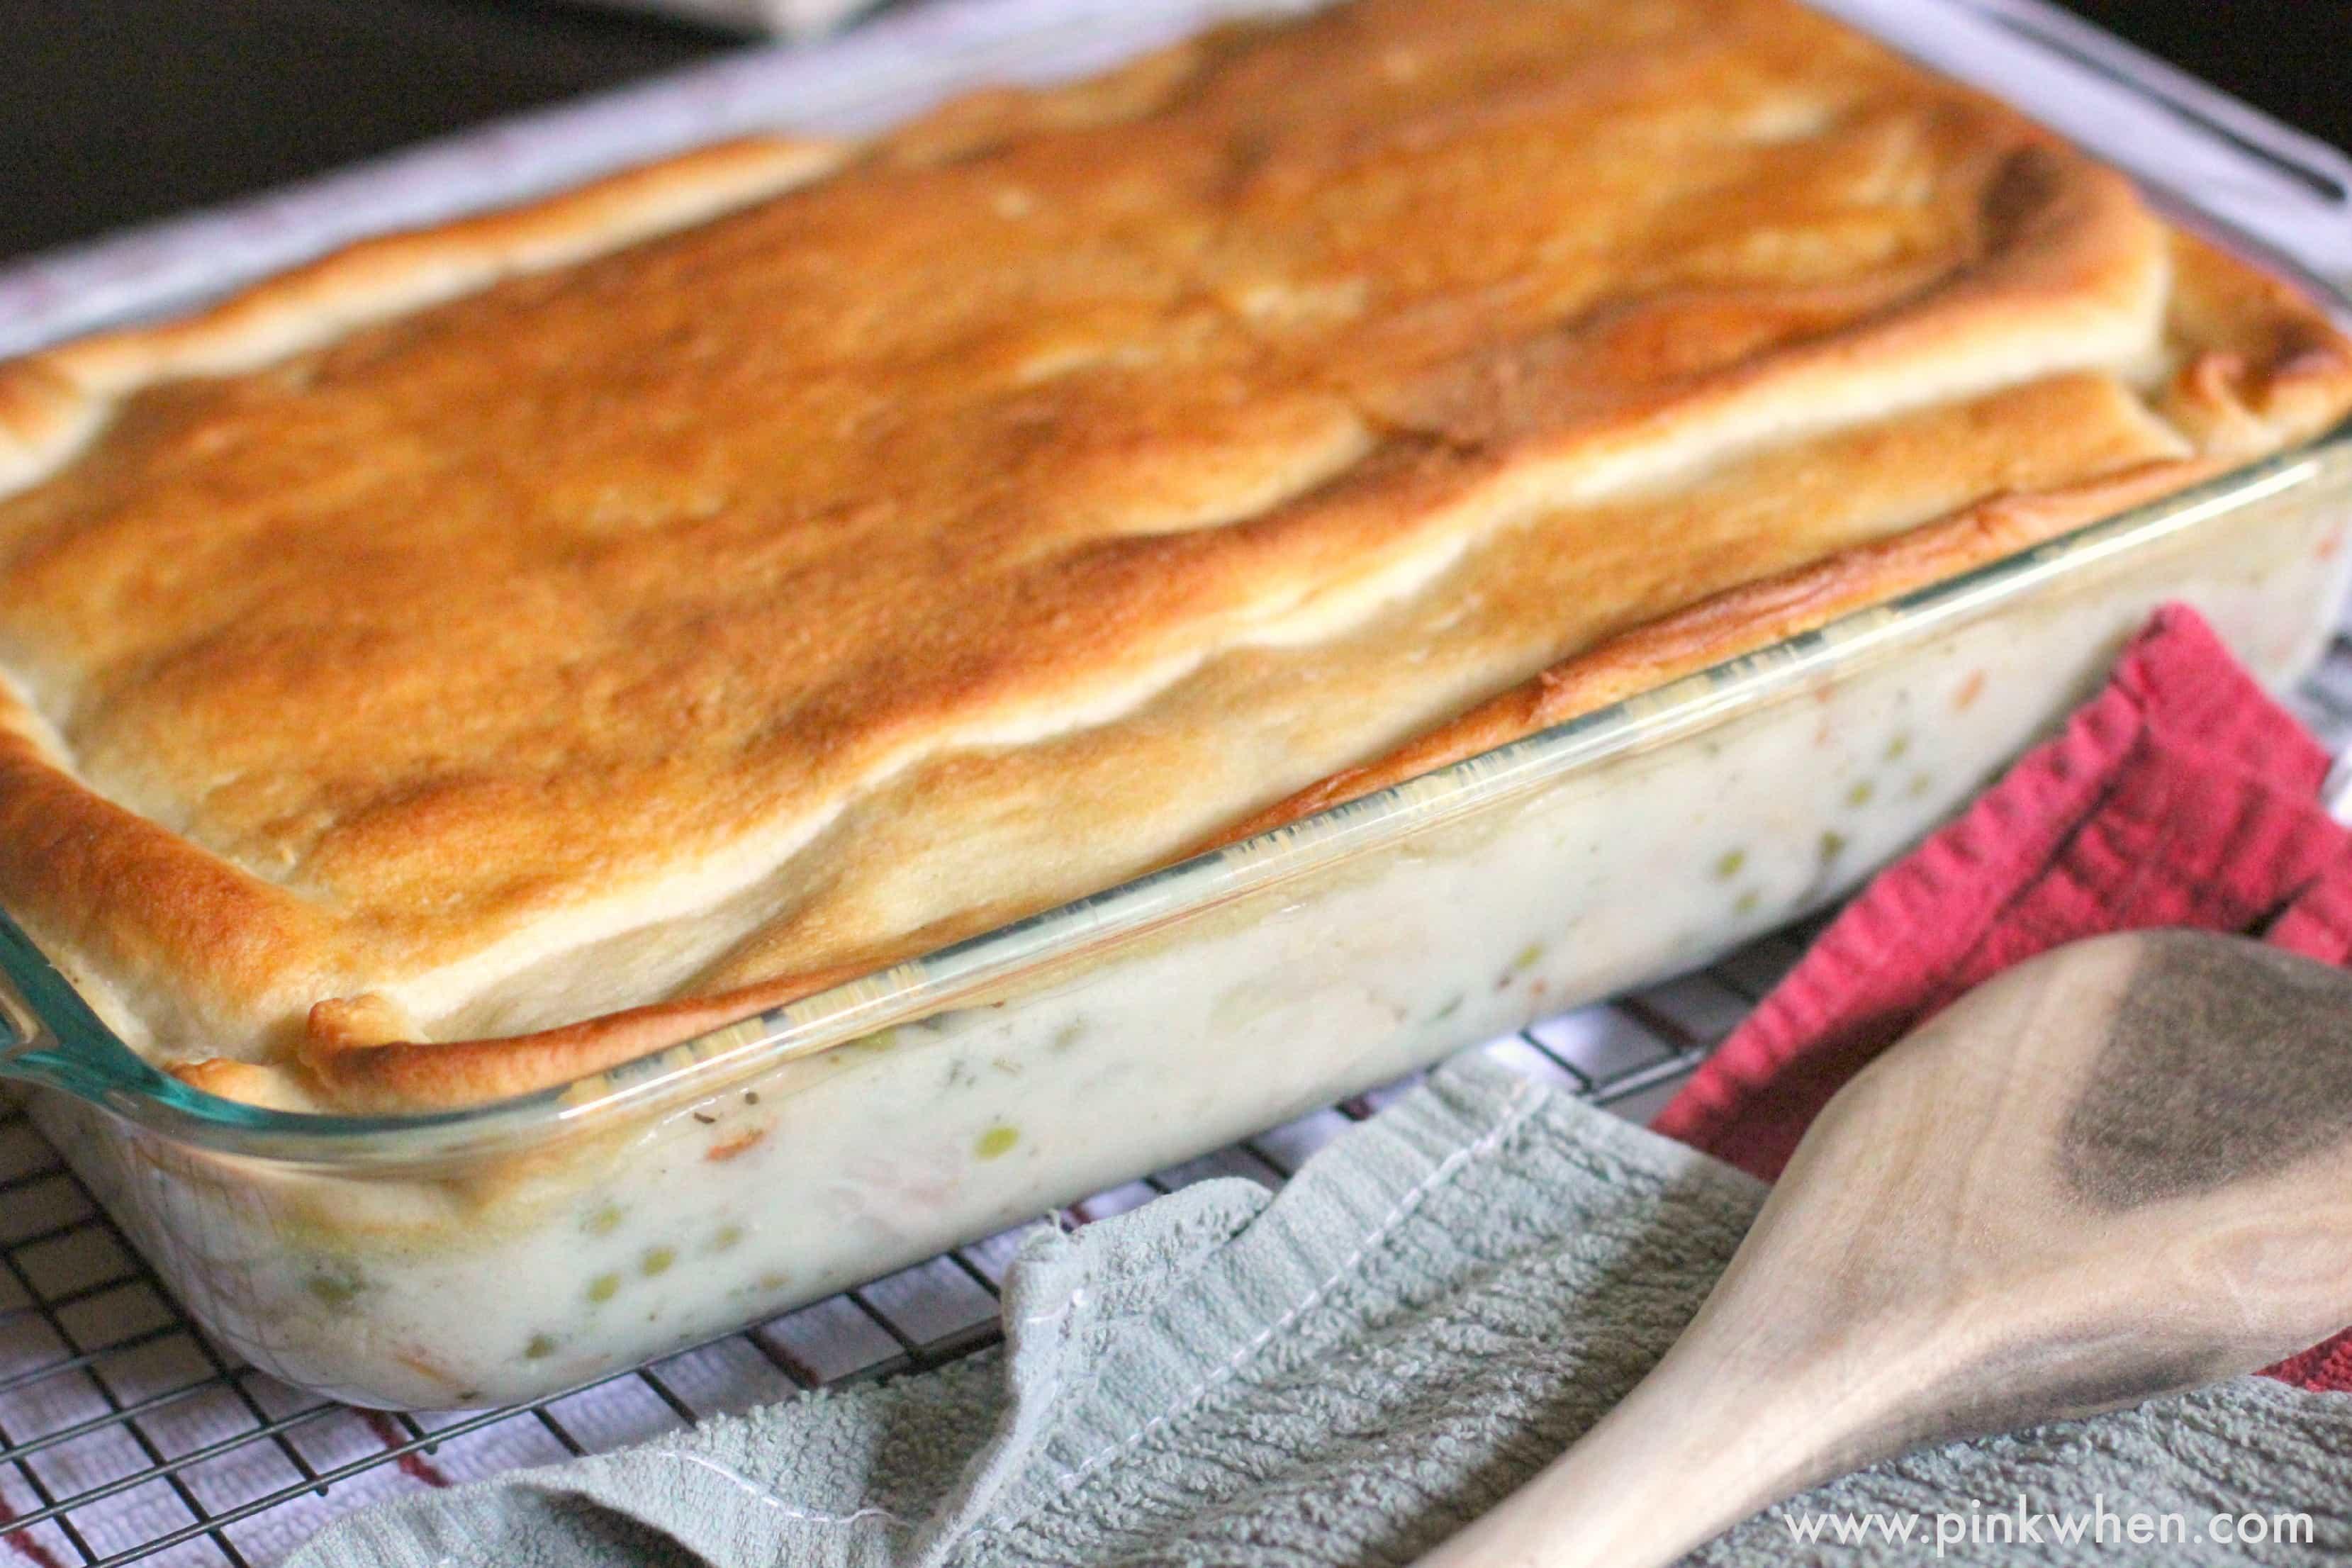 Amazing Chicken Pot Pie Recipe   Page 2 of 2   PinkWhen